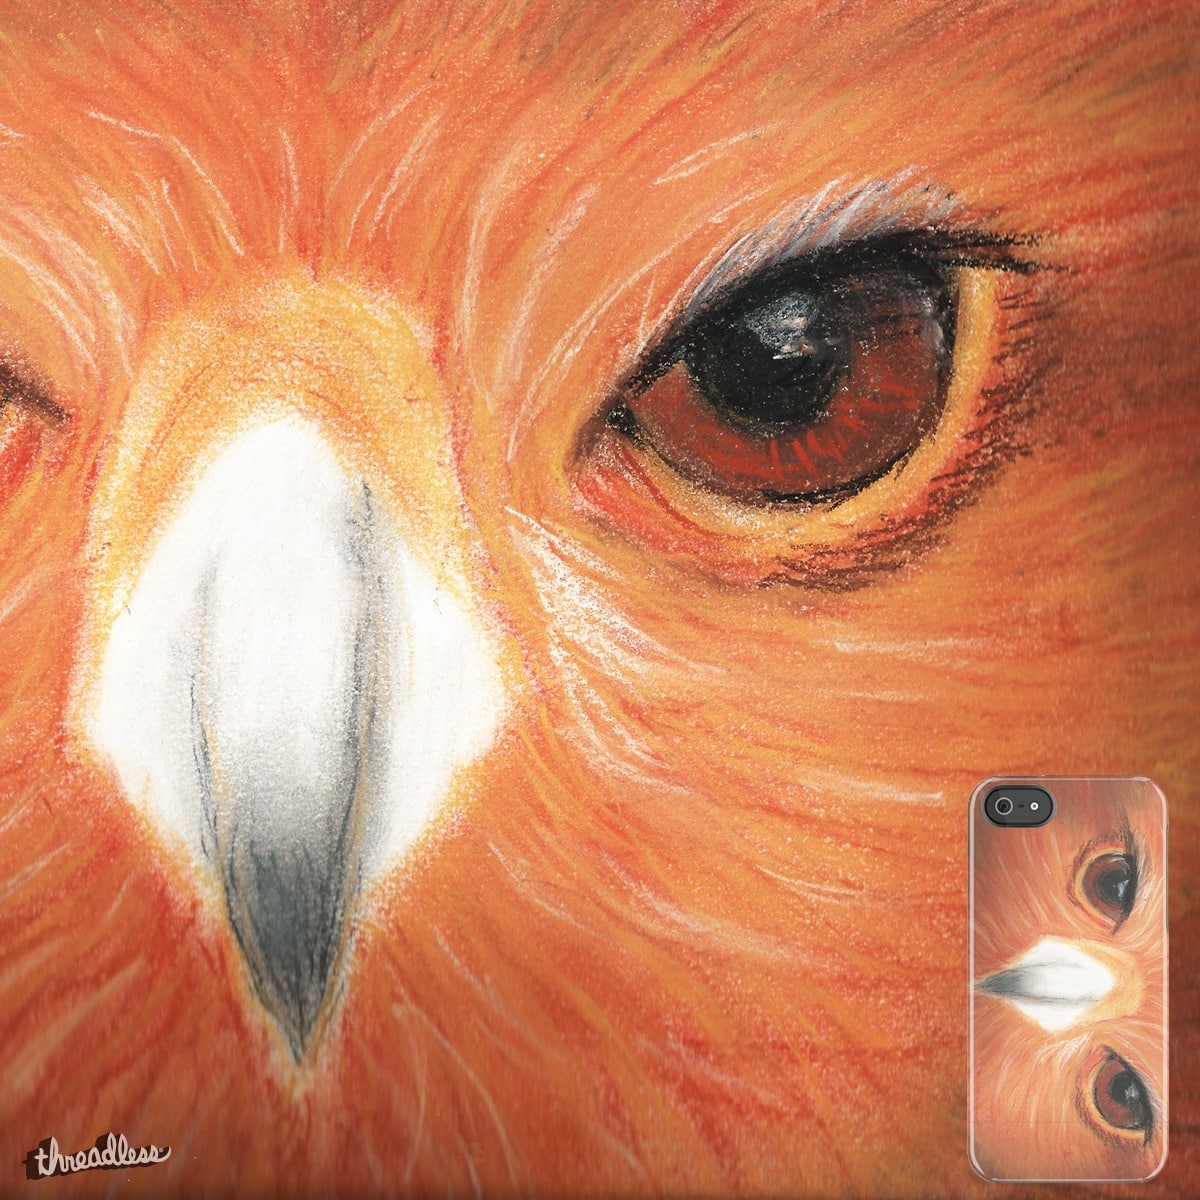 buzzard eyes by laure.detre on Threadless